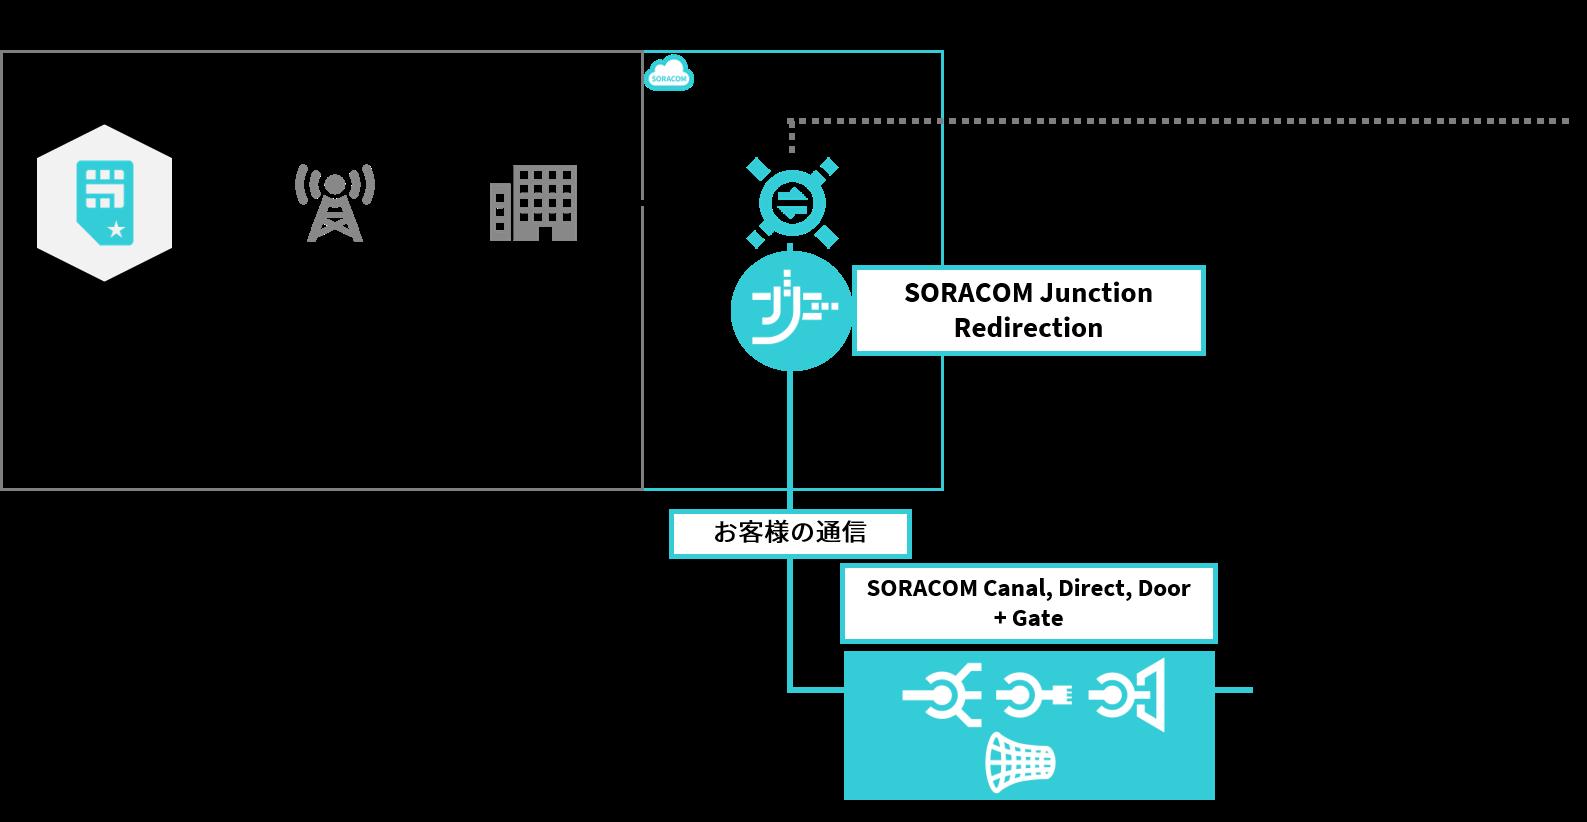 SORACOM Junction Redirection